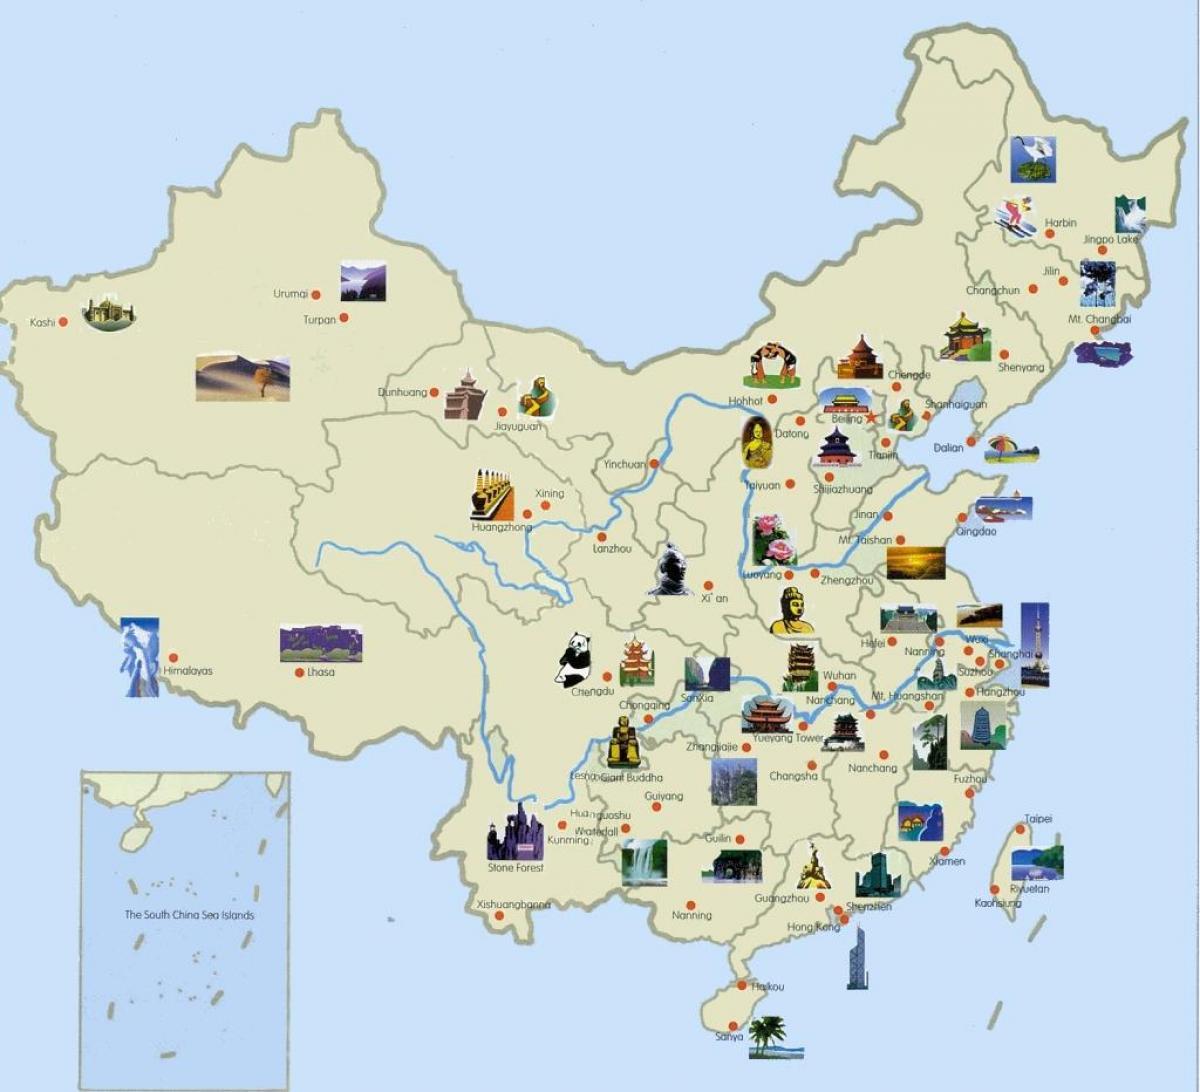 Carte Touristique Asie.La Chine Carte Touristique Carte Touristique De La Chine